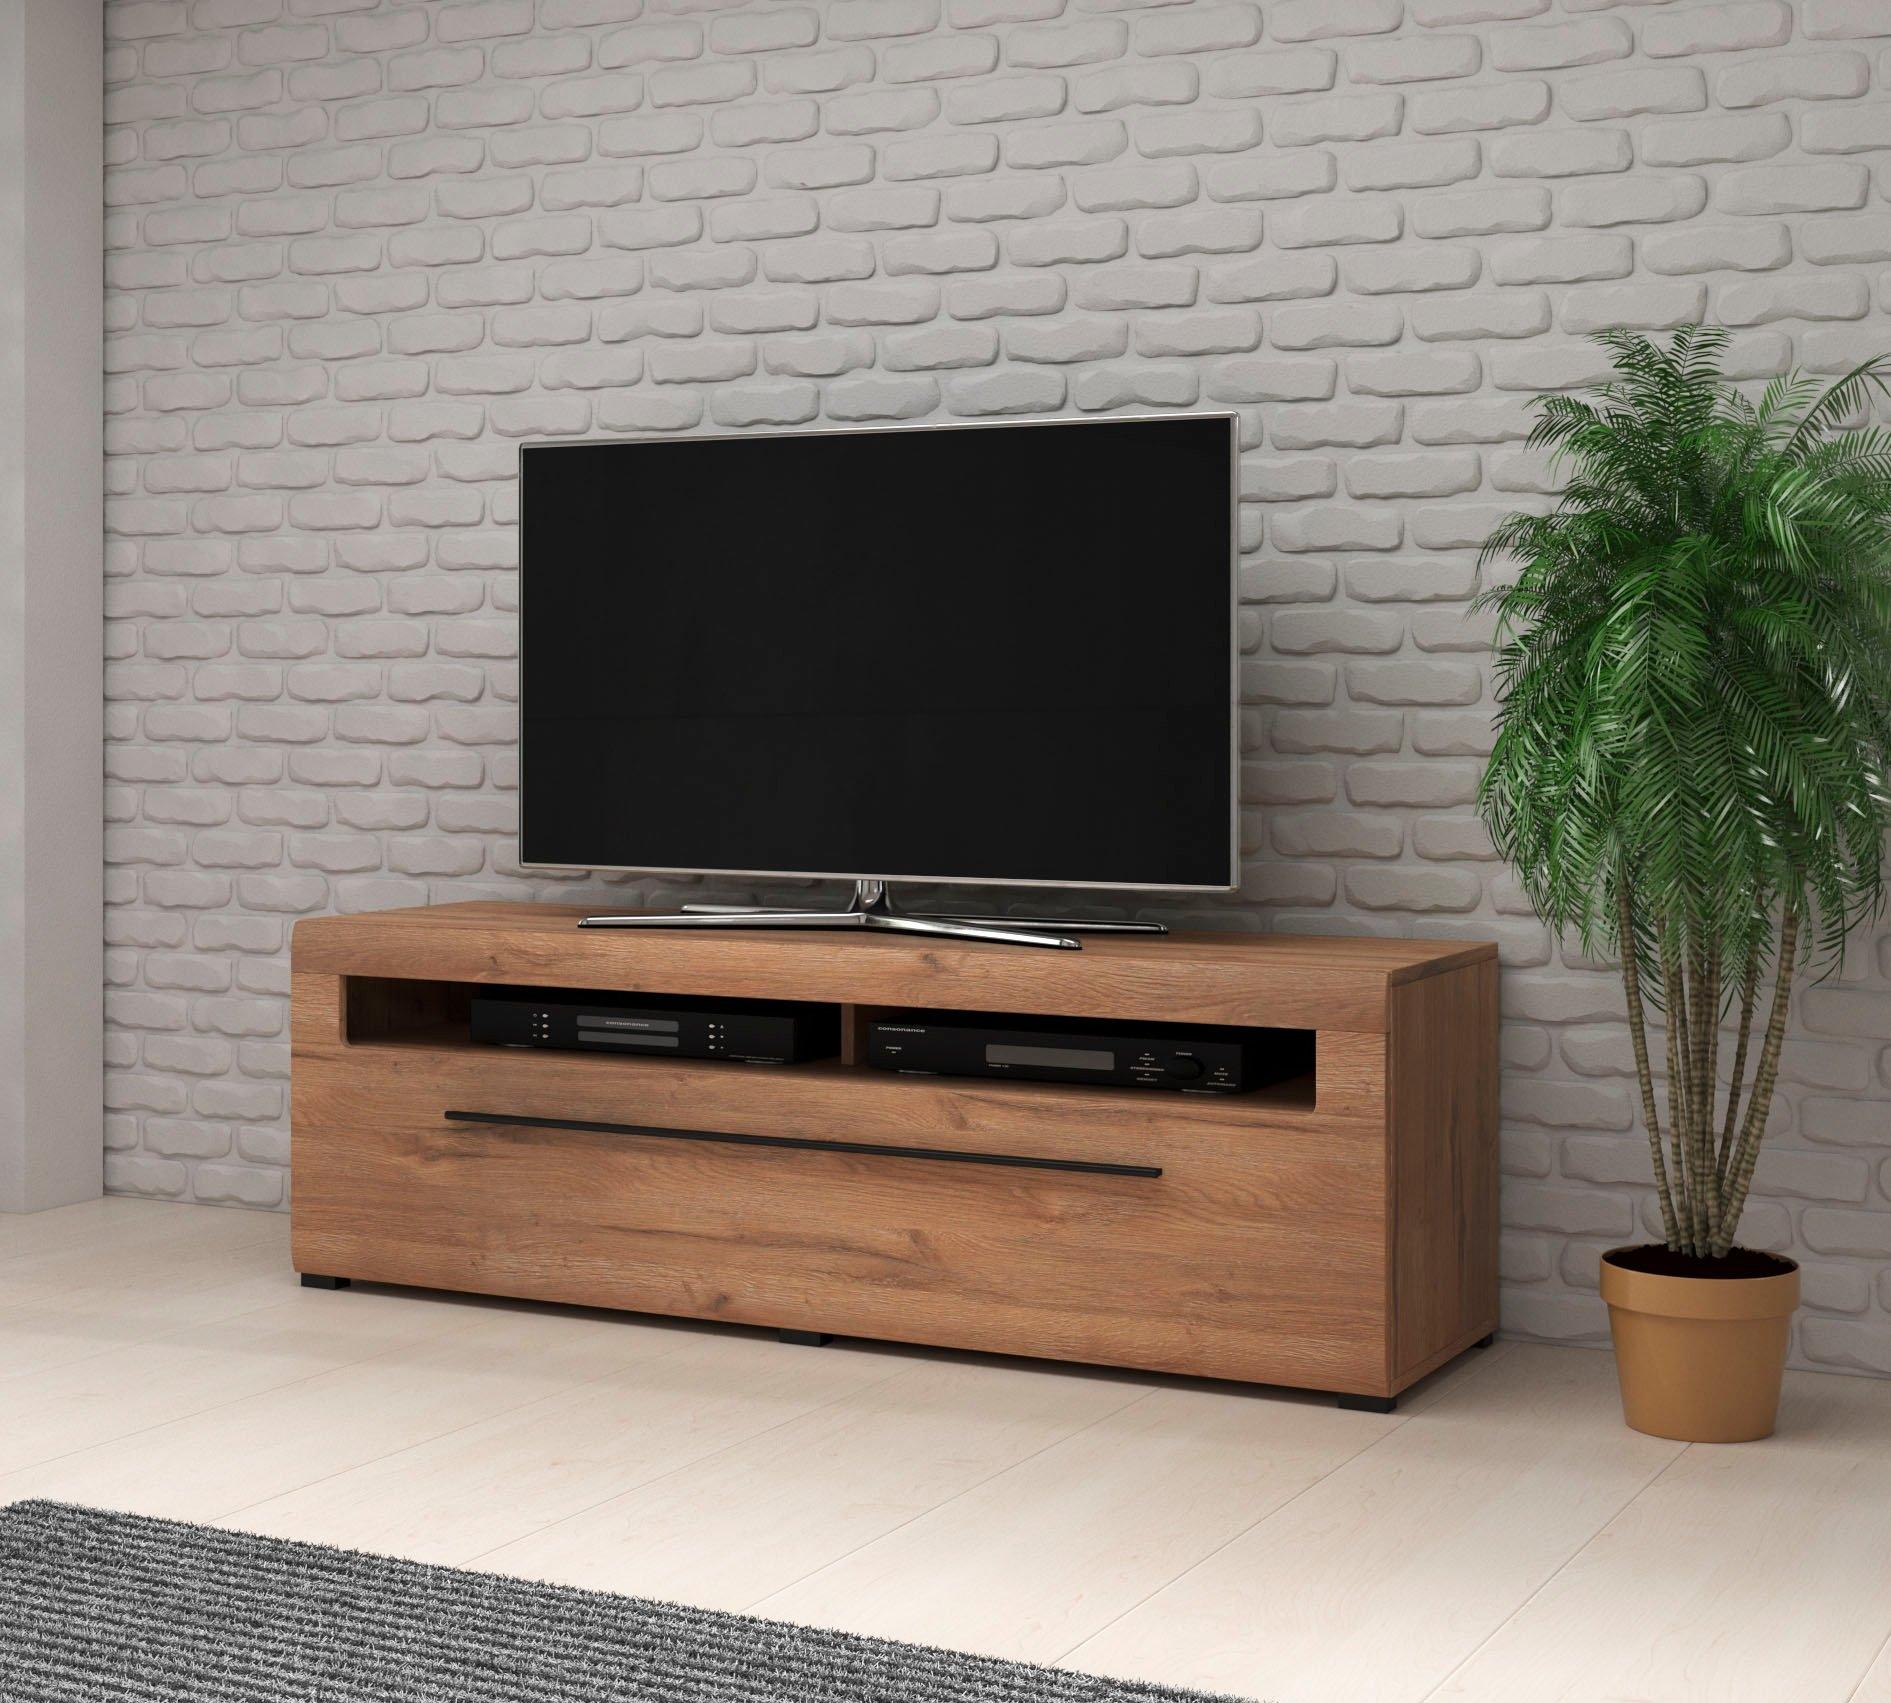 TRENDMANUFAKTUR tv-meubel »Tulsa« - gratis ruilen op otto.nl